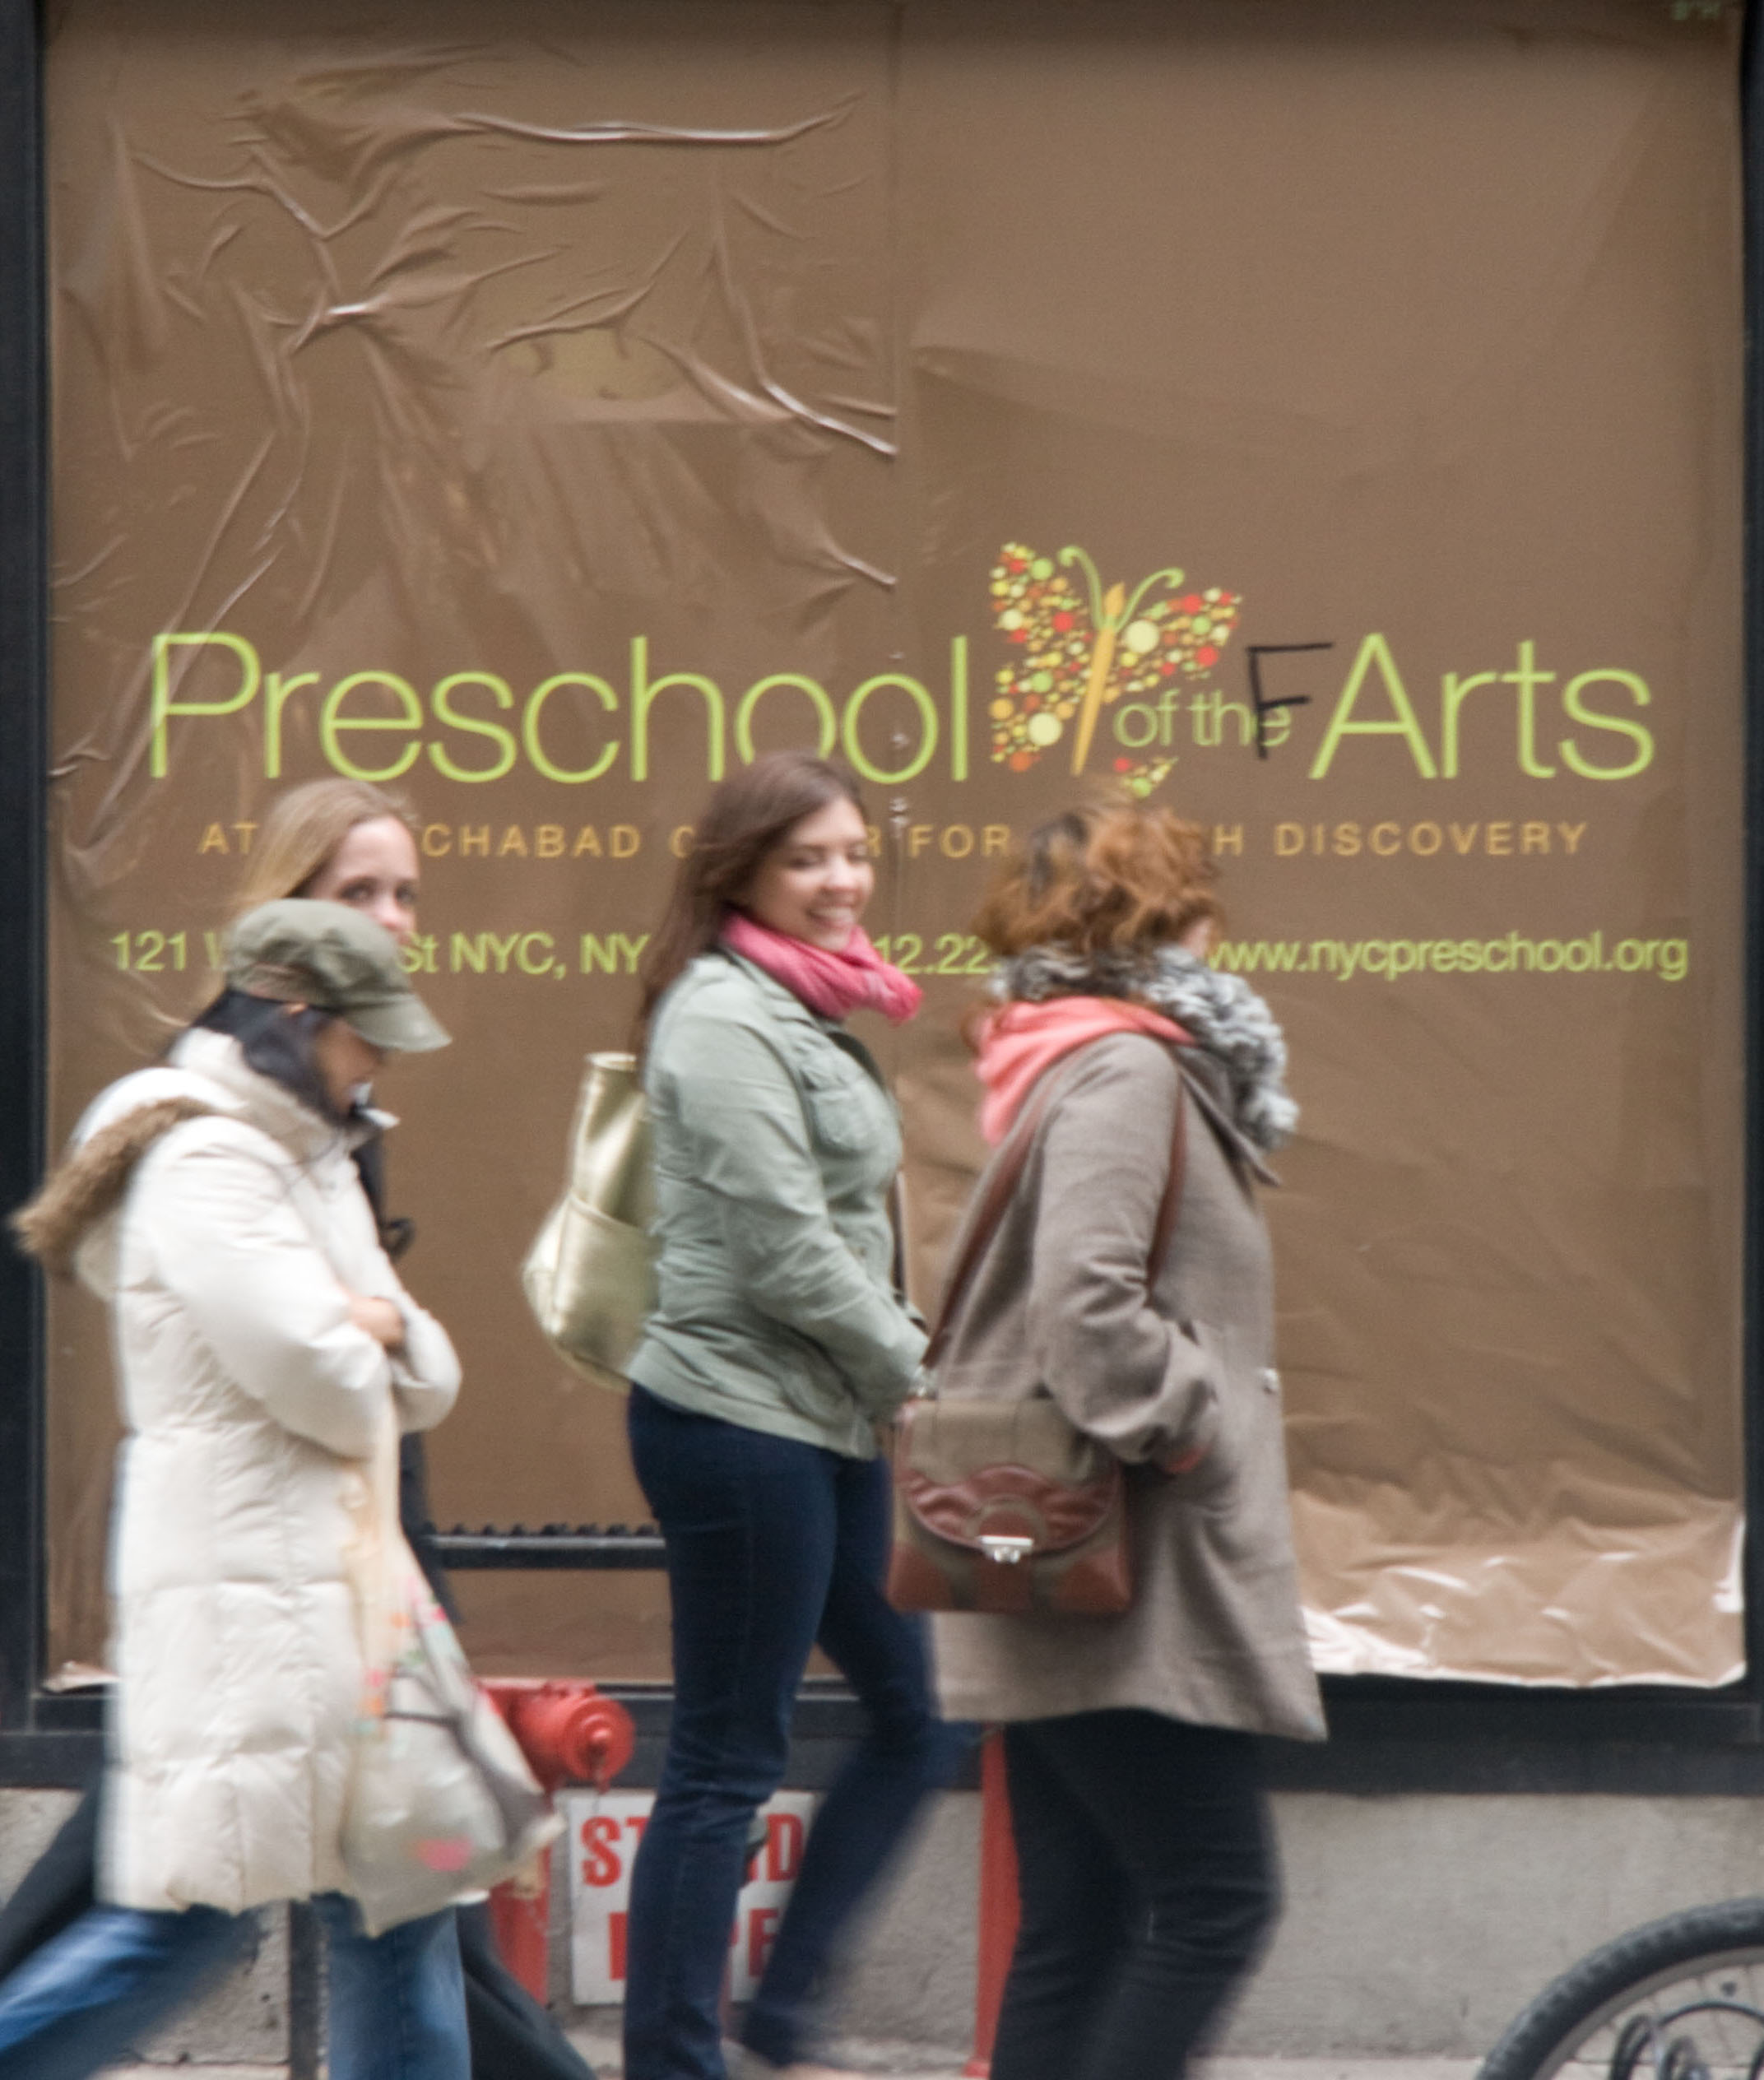 Preschool of the Farts NYC